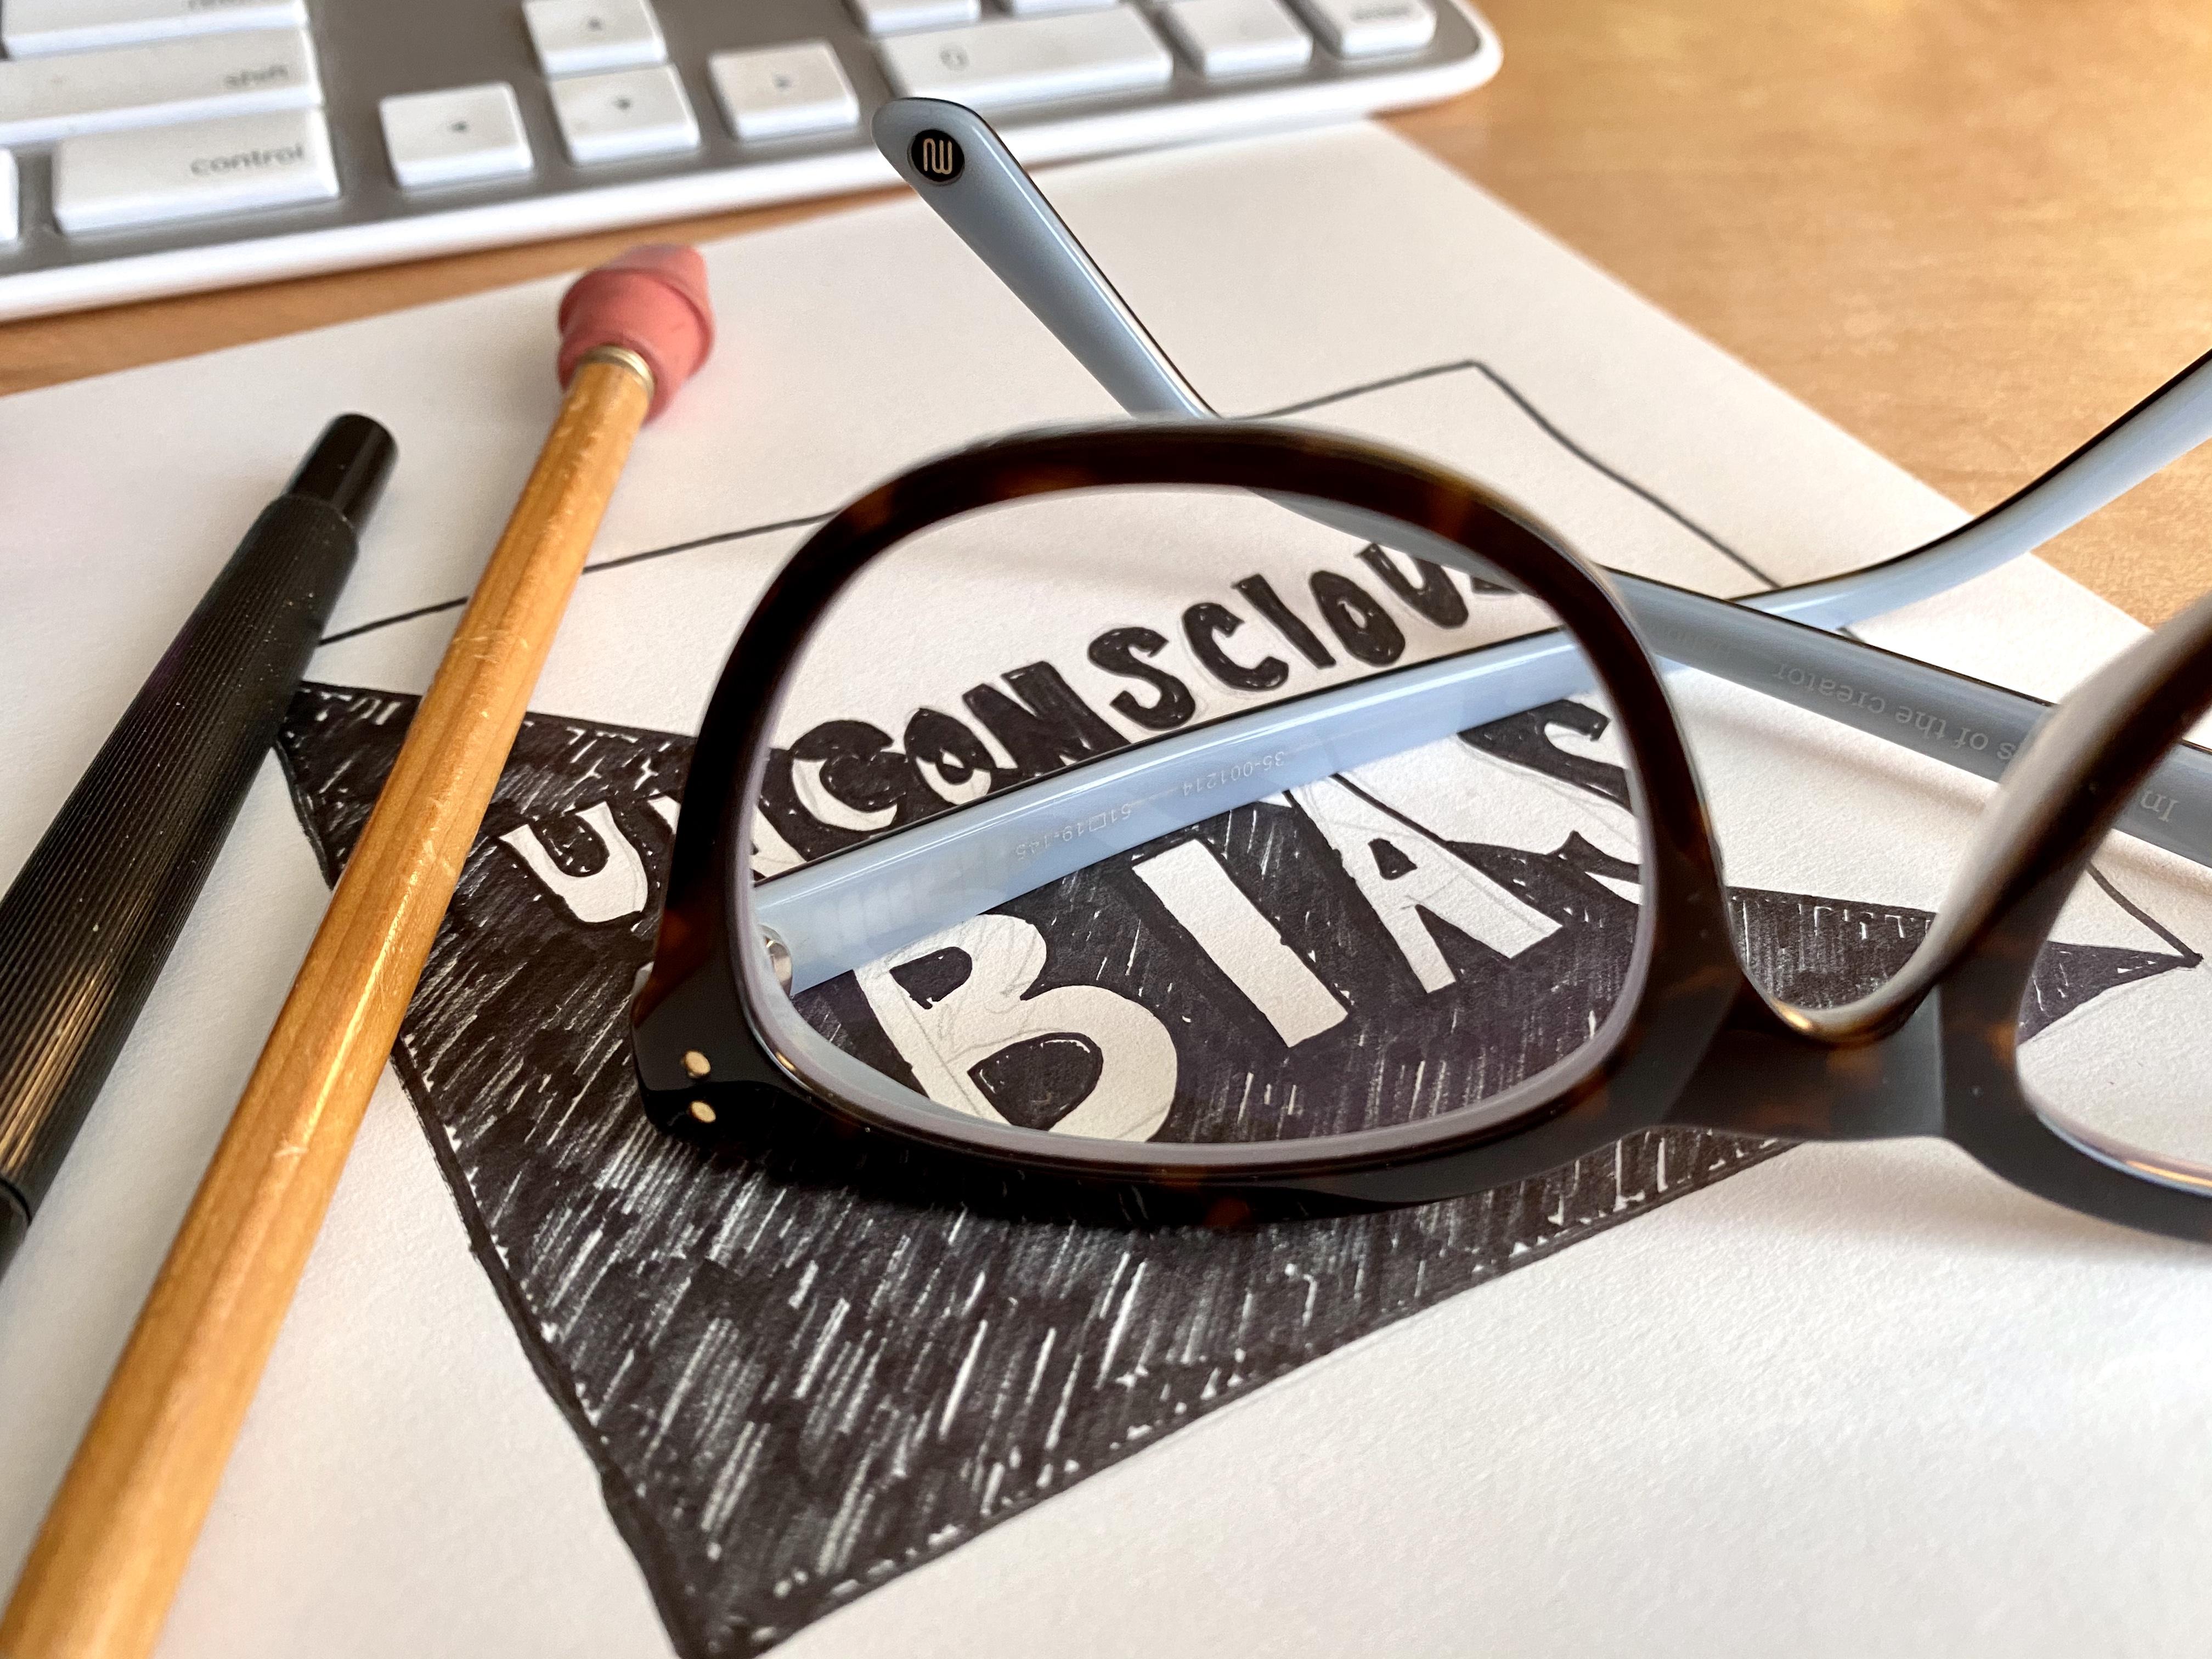 Unconscious bias in writing